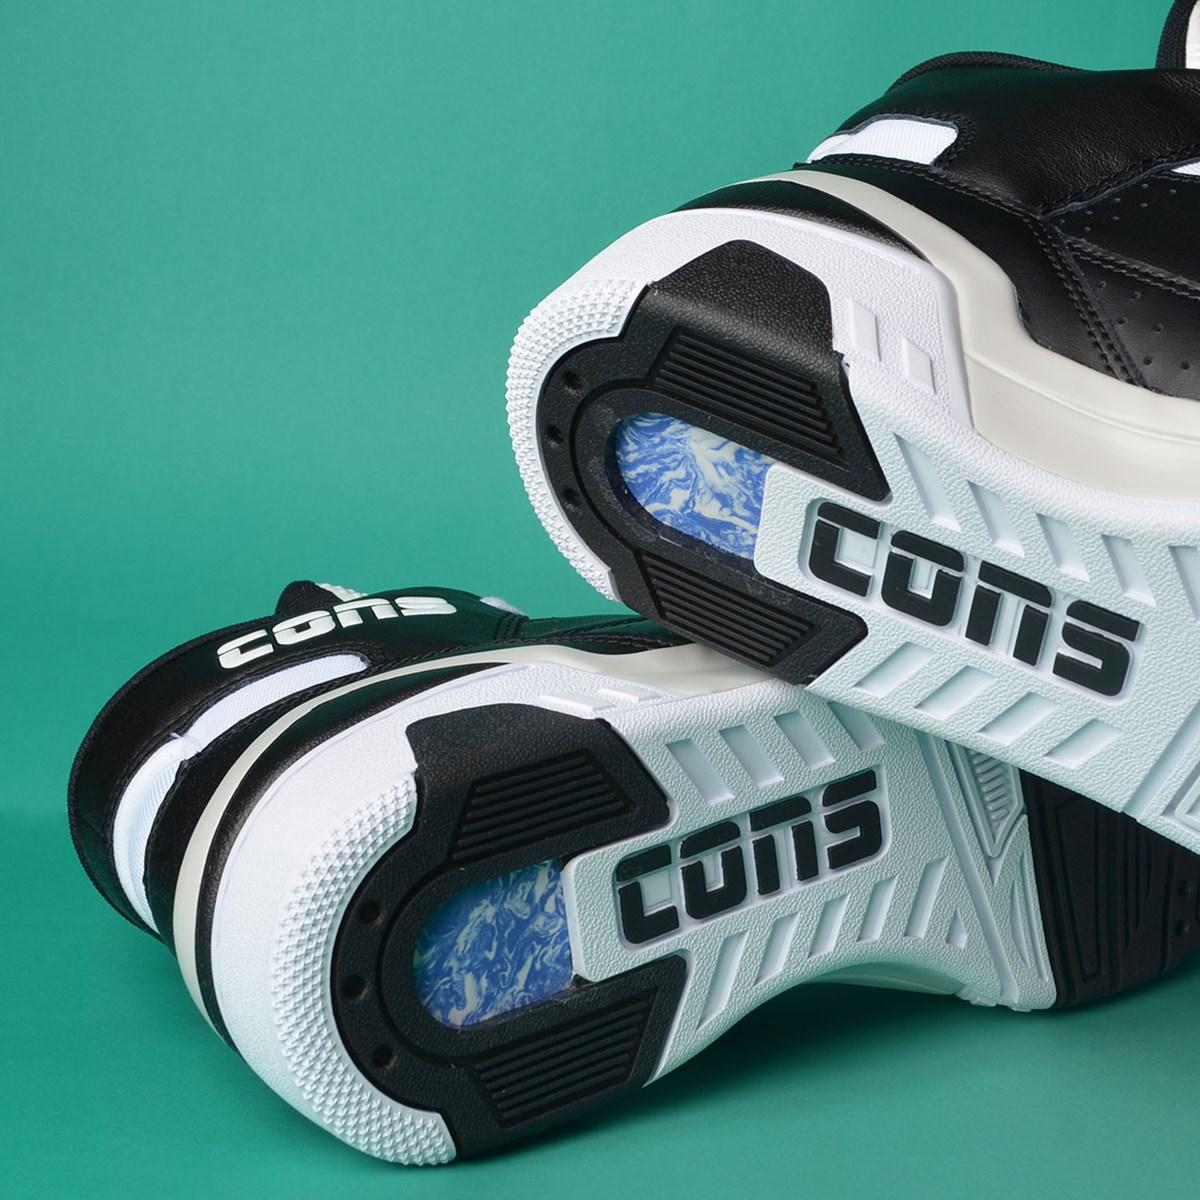 Tênis Converse ERX 260 Mid Black Mouse White 166325C